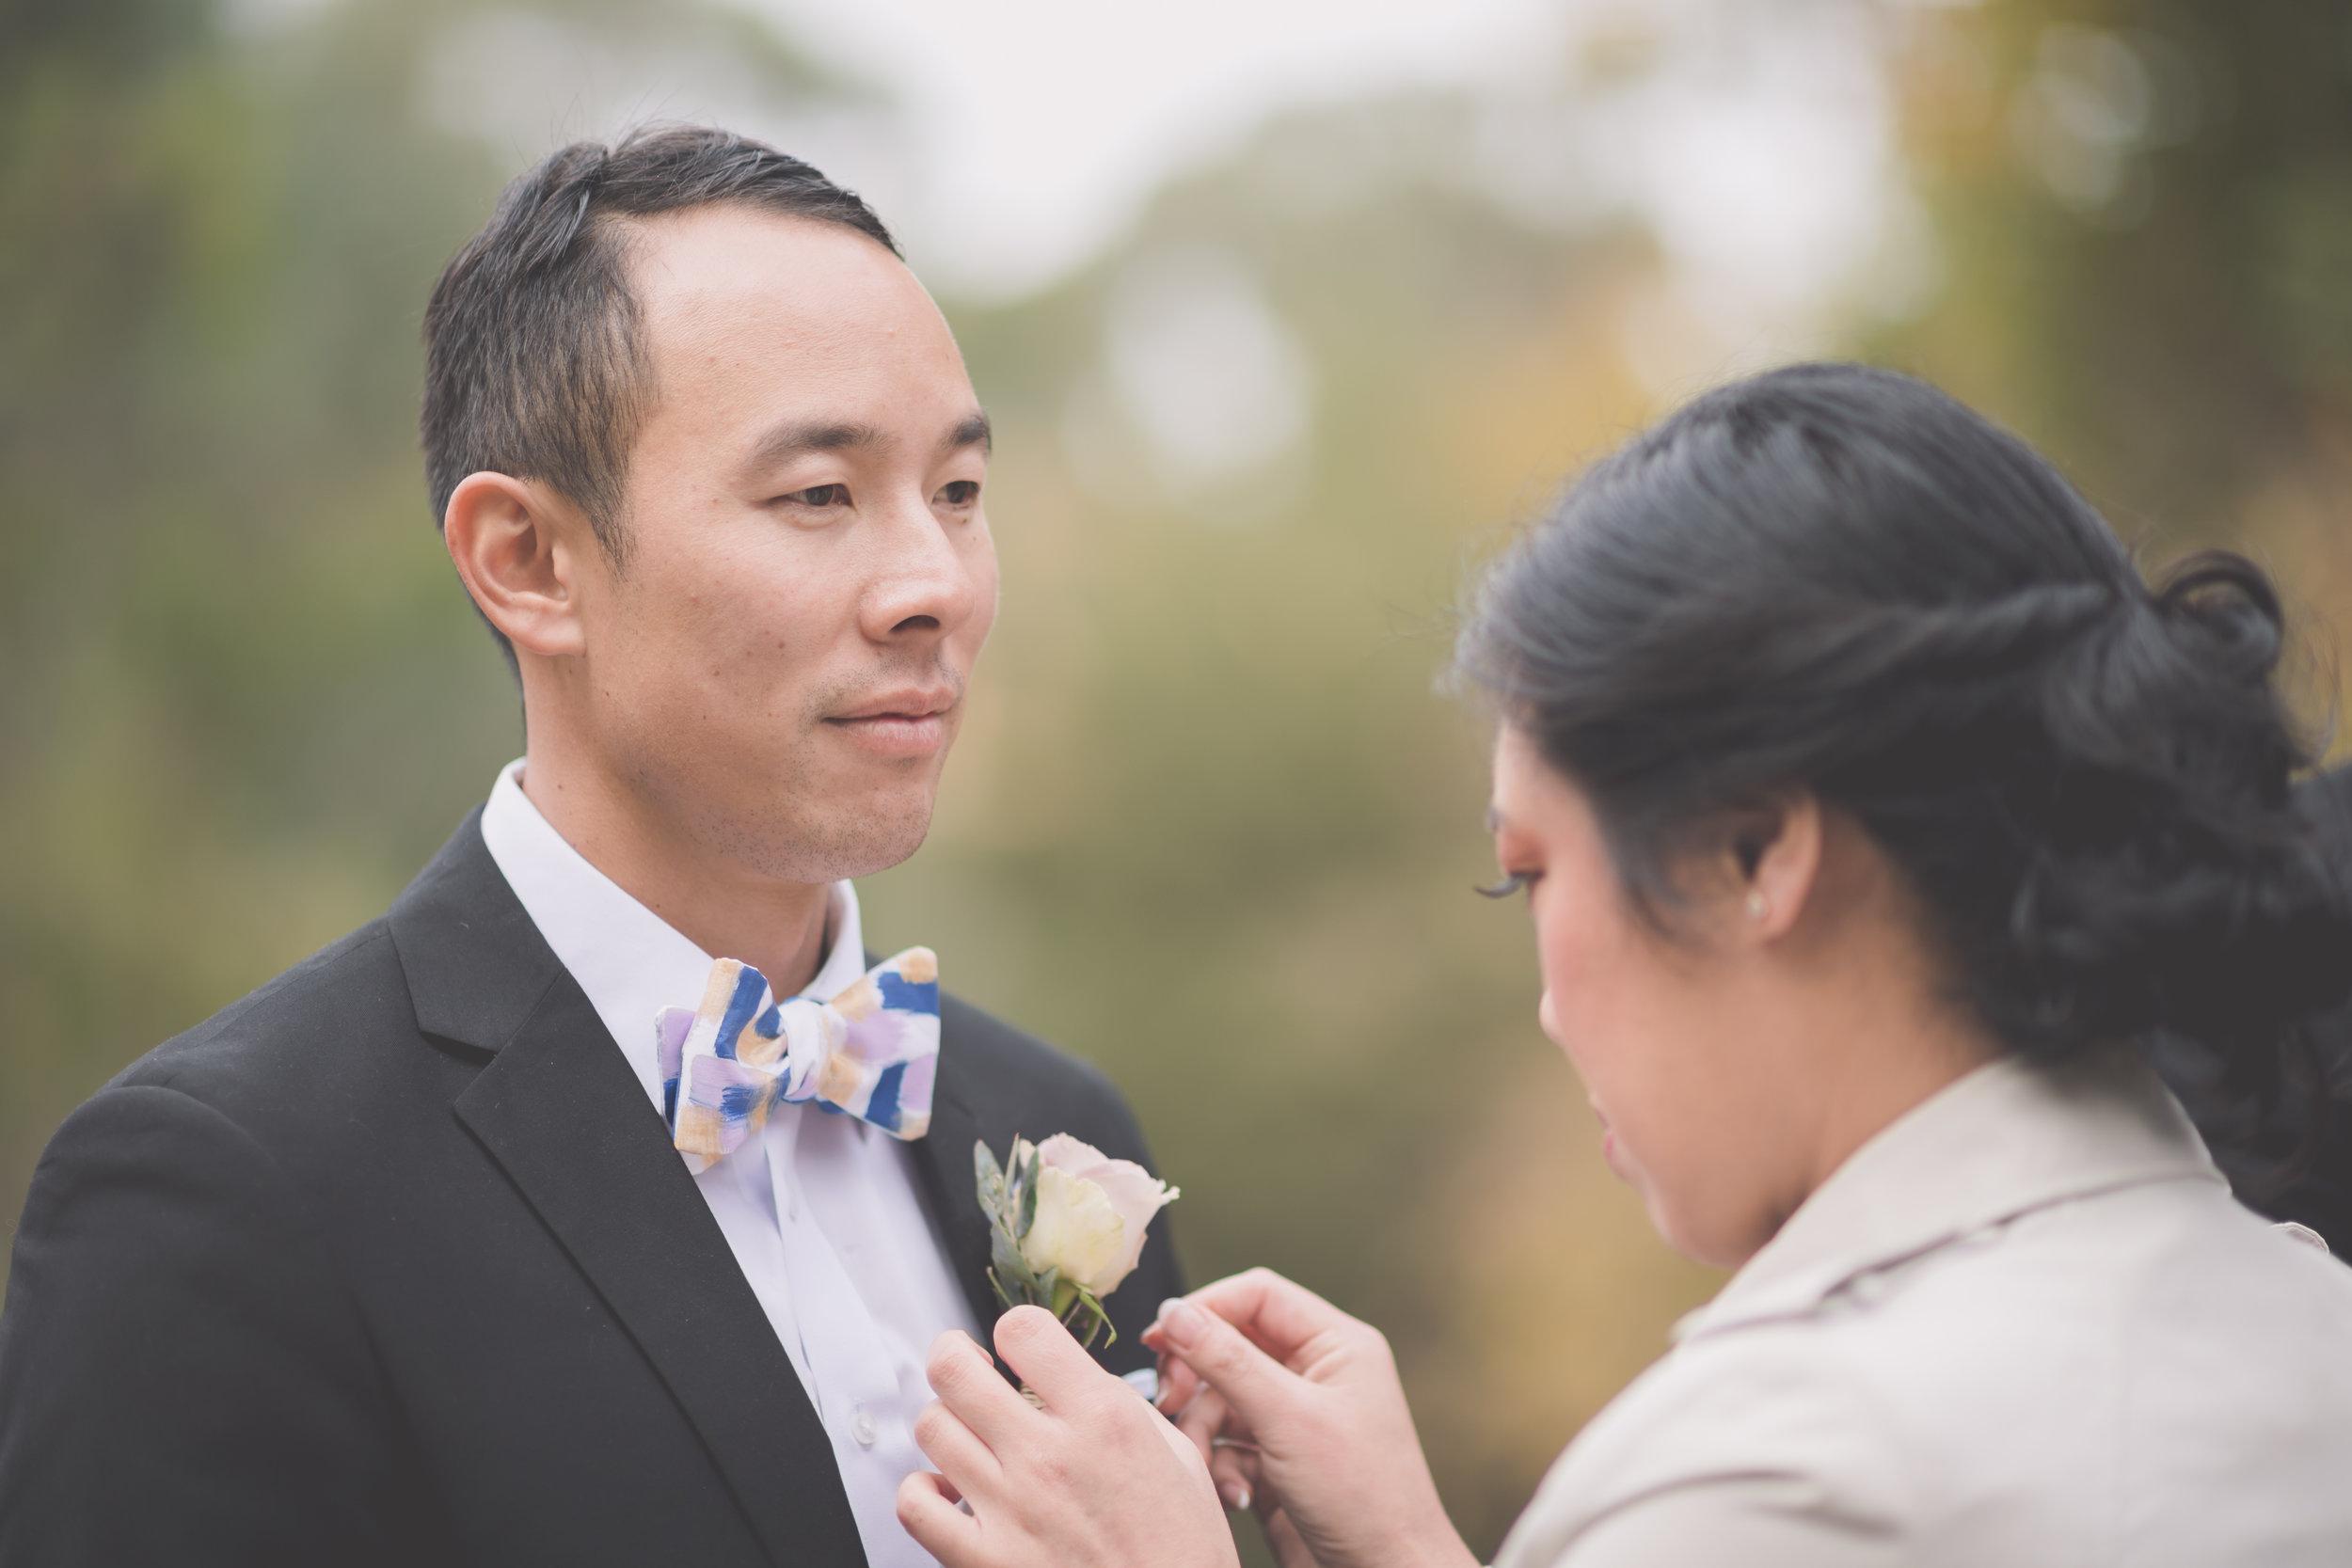 edward kwan custom hand painted bow ties melbourne australia 3.JPG